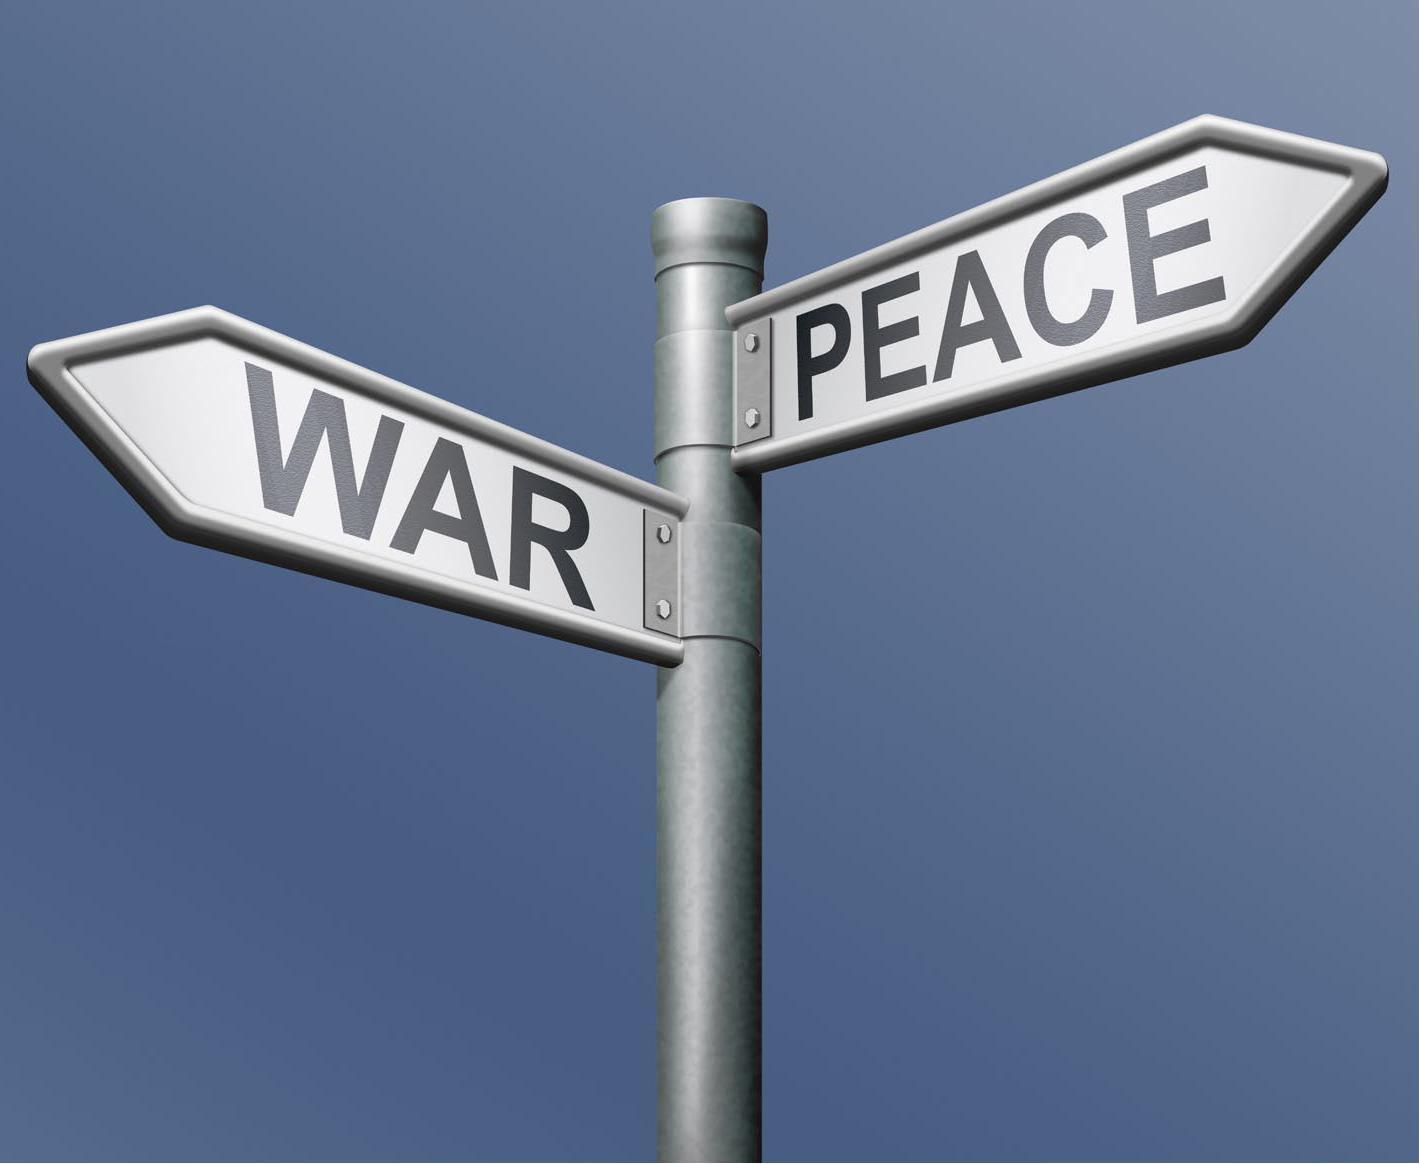 Risultati immagini per peace war